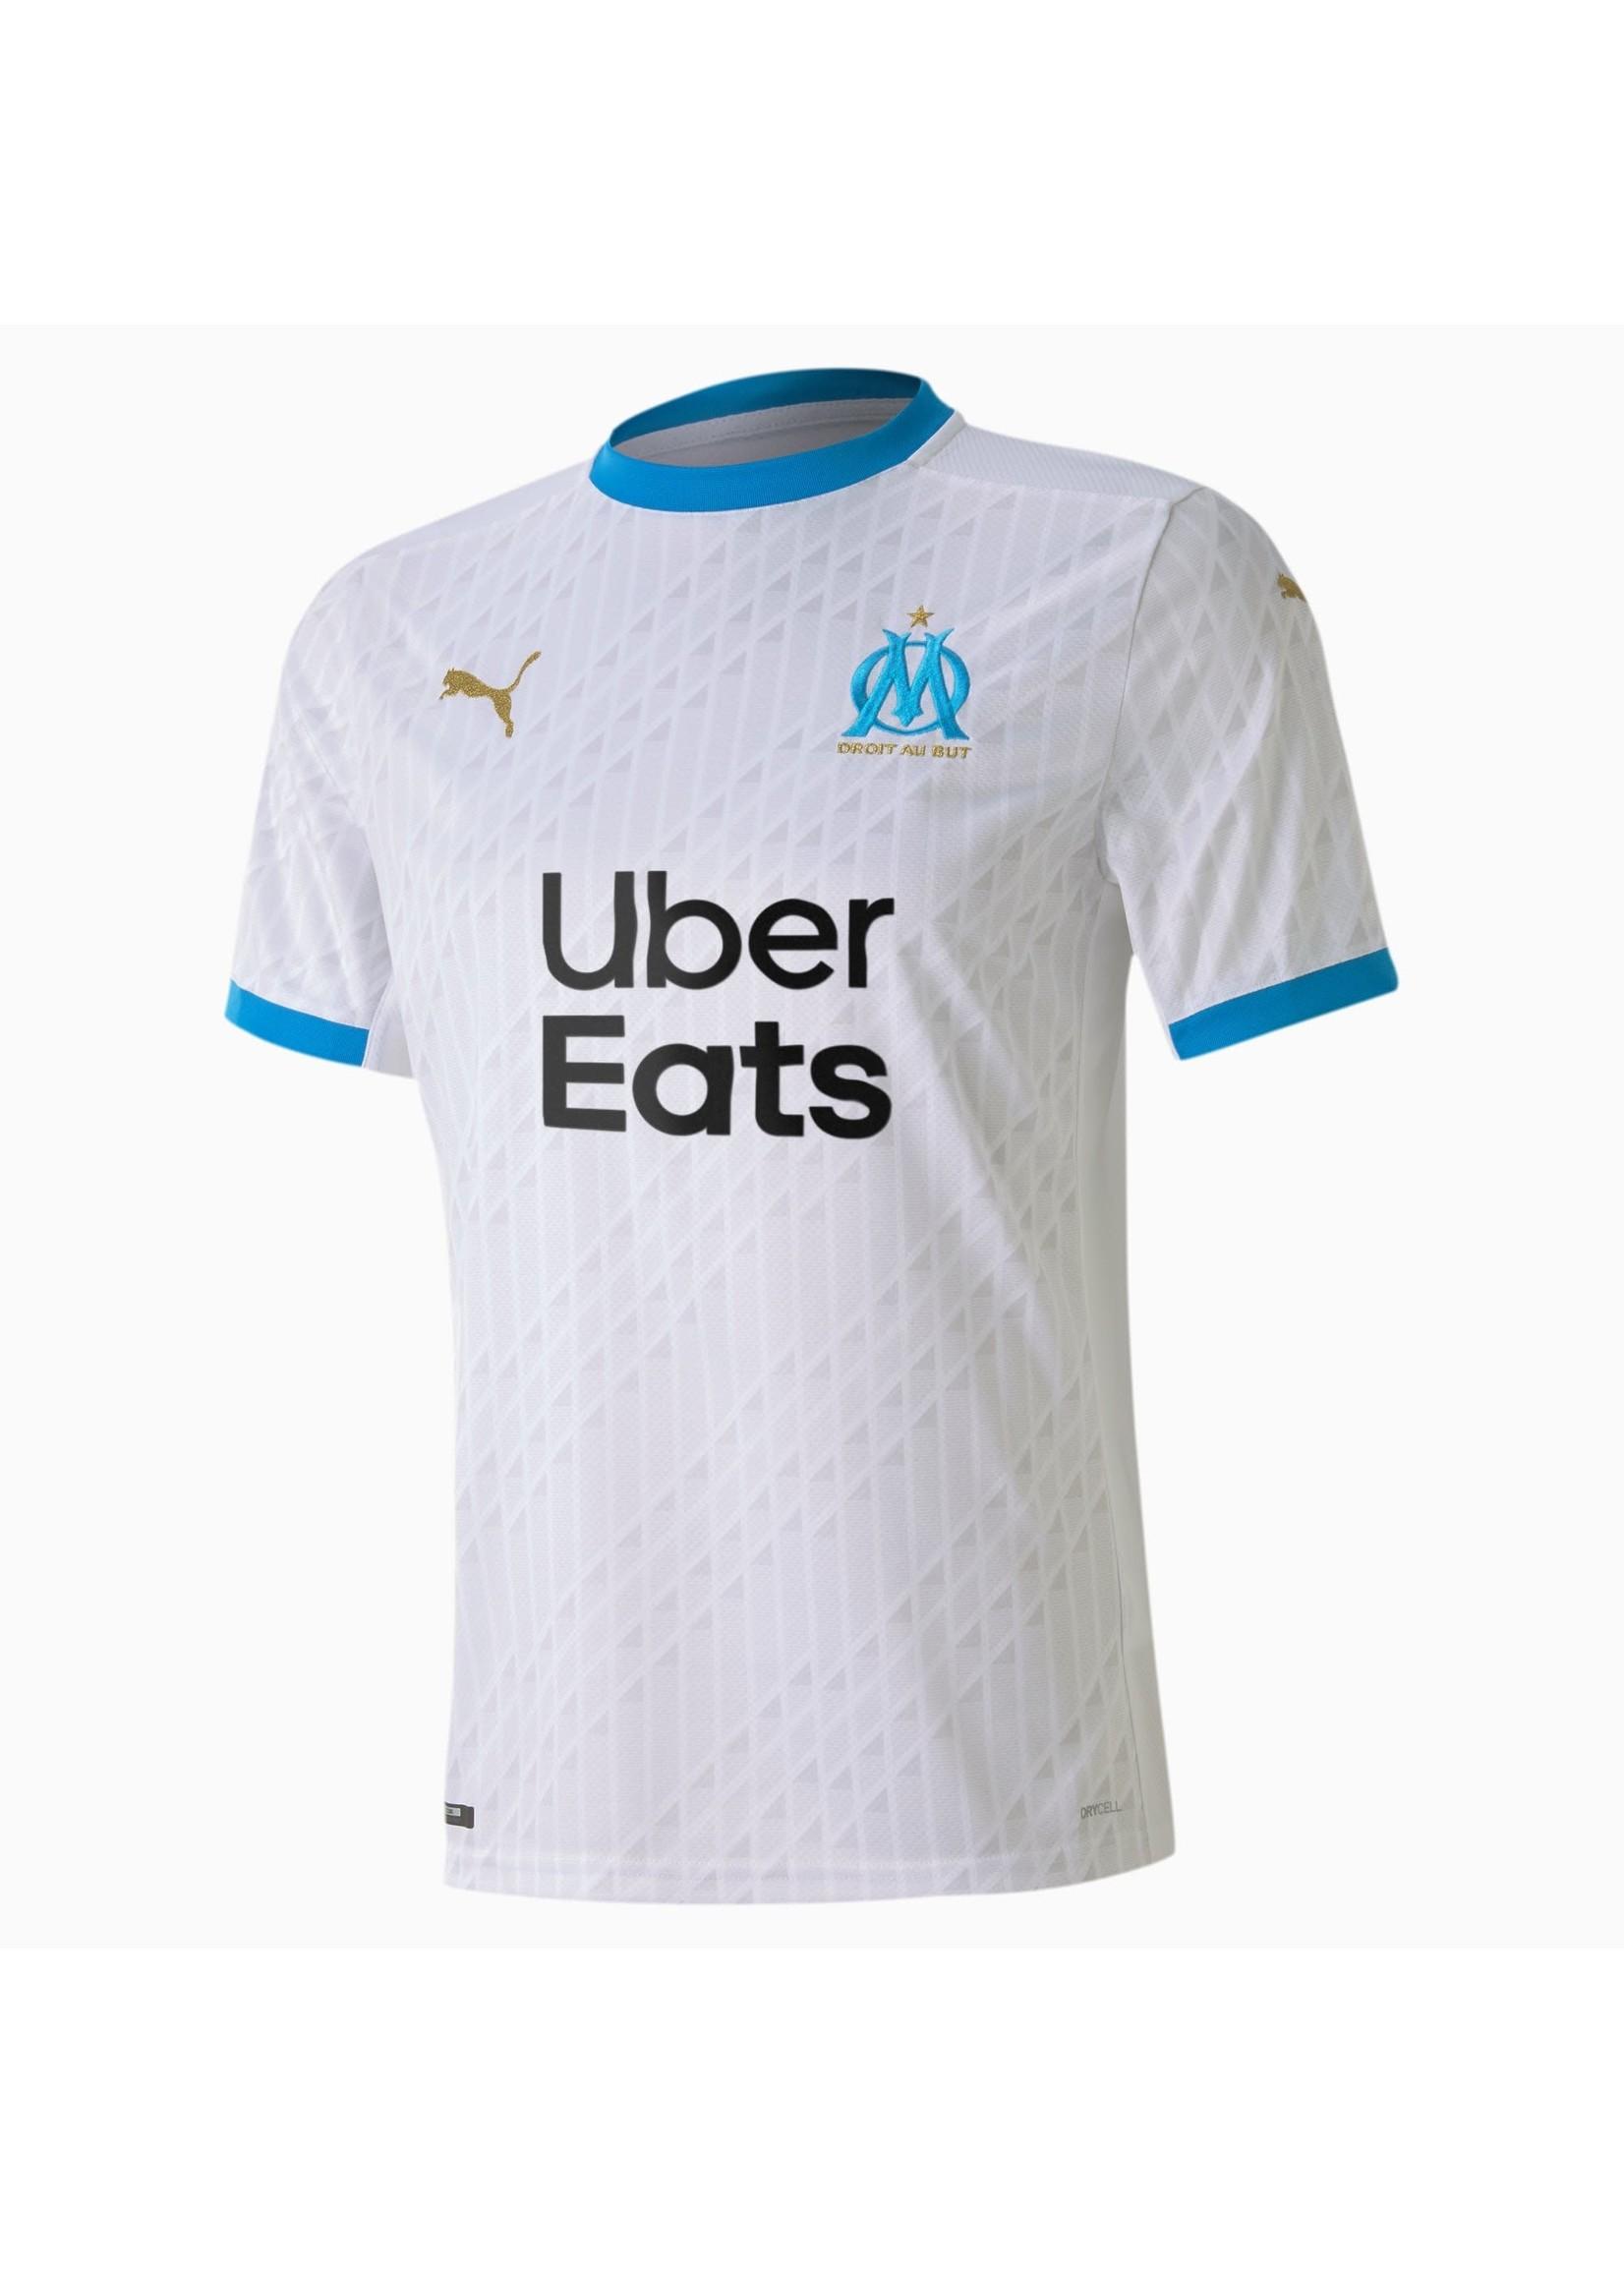 Puma Olympique de Marseille 20/21 Home Jersey Adult